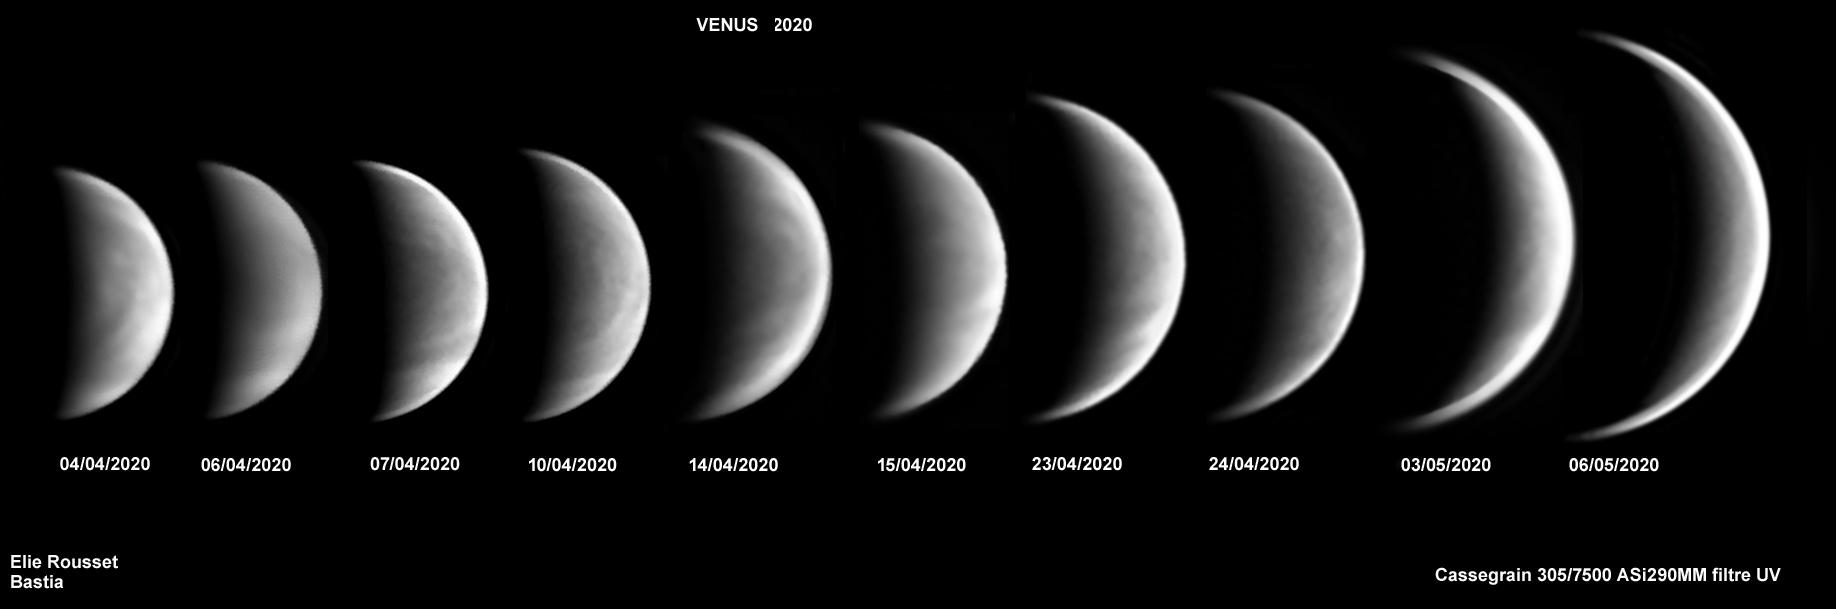 large.VENUS-2020-planche-2.jpg.8c00c71943e342741a1ecbf5e358a3e8.jpg